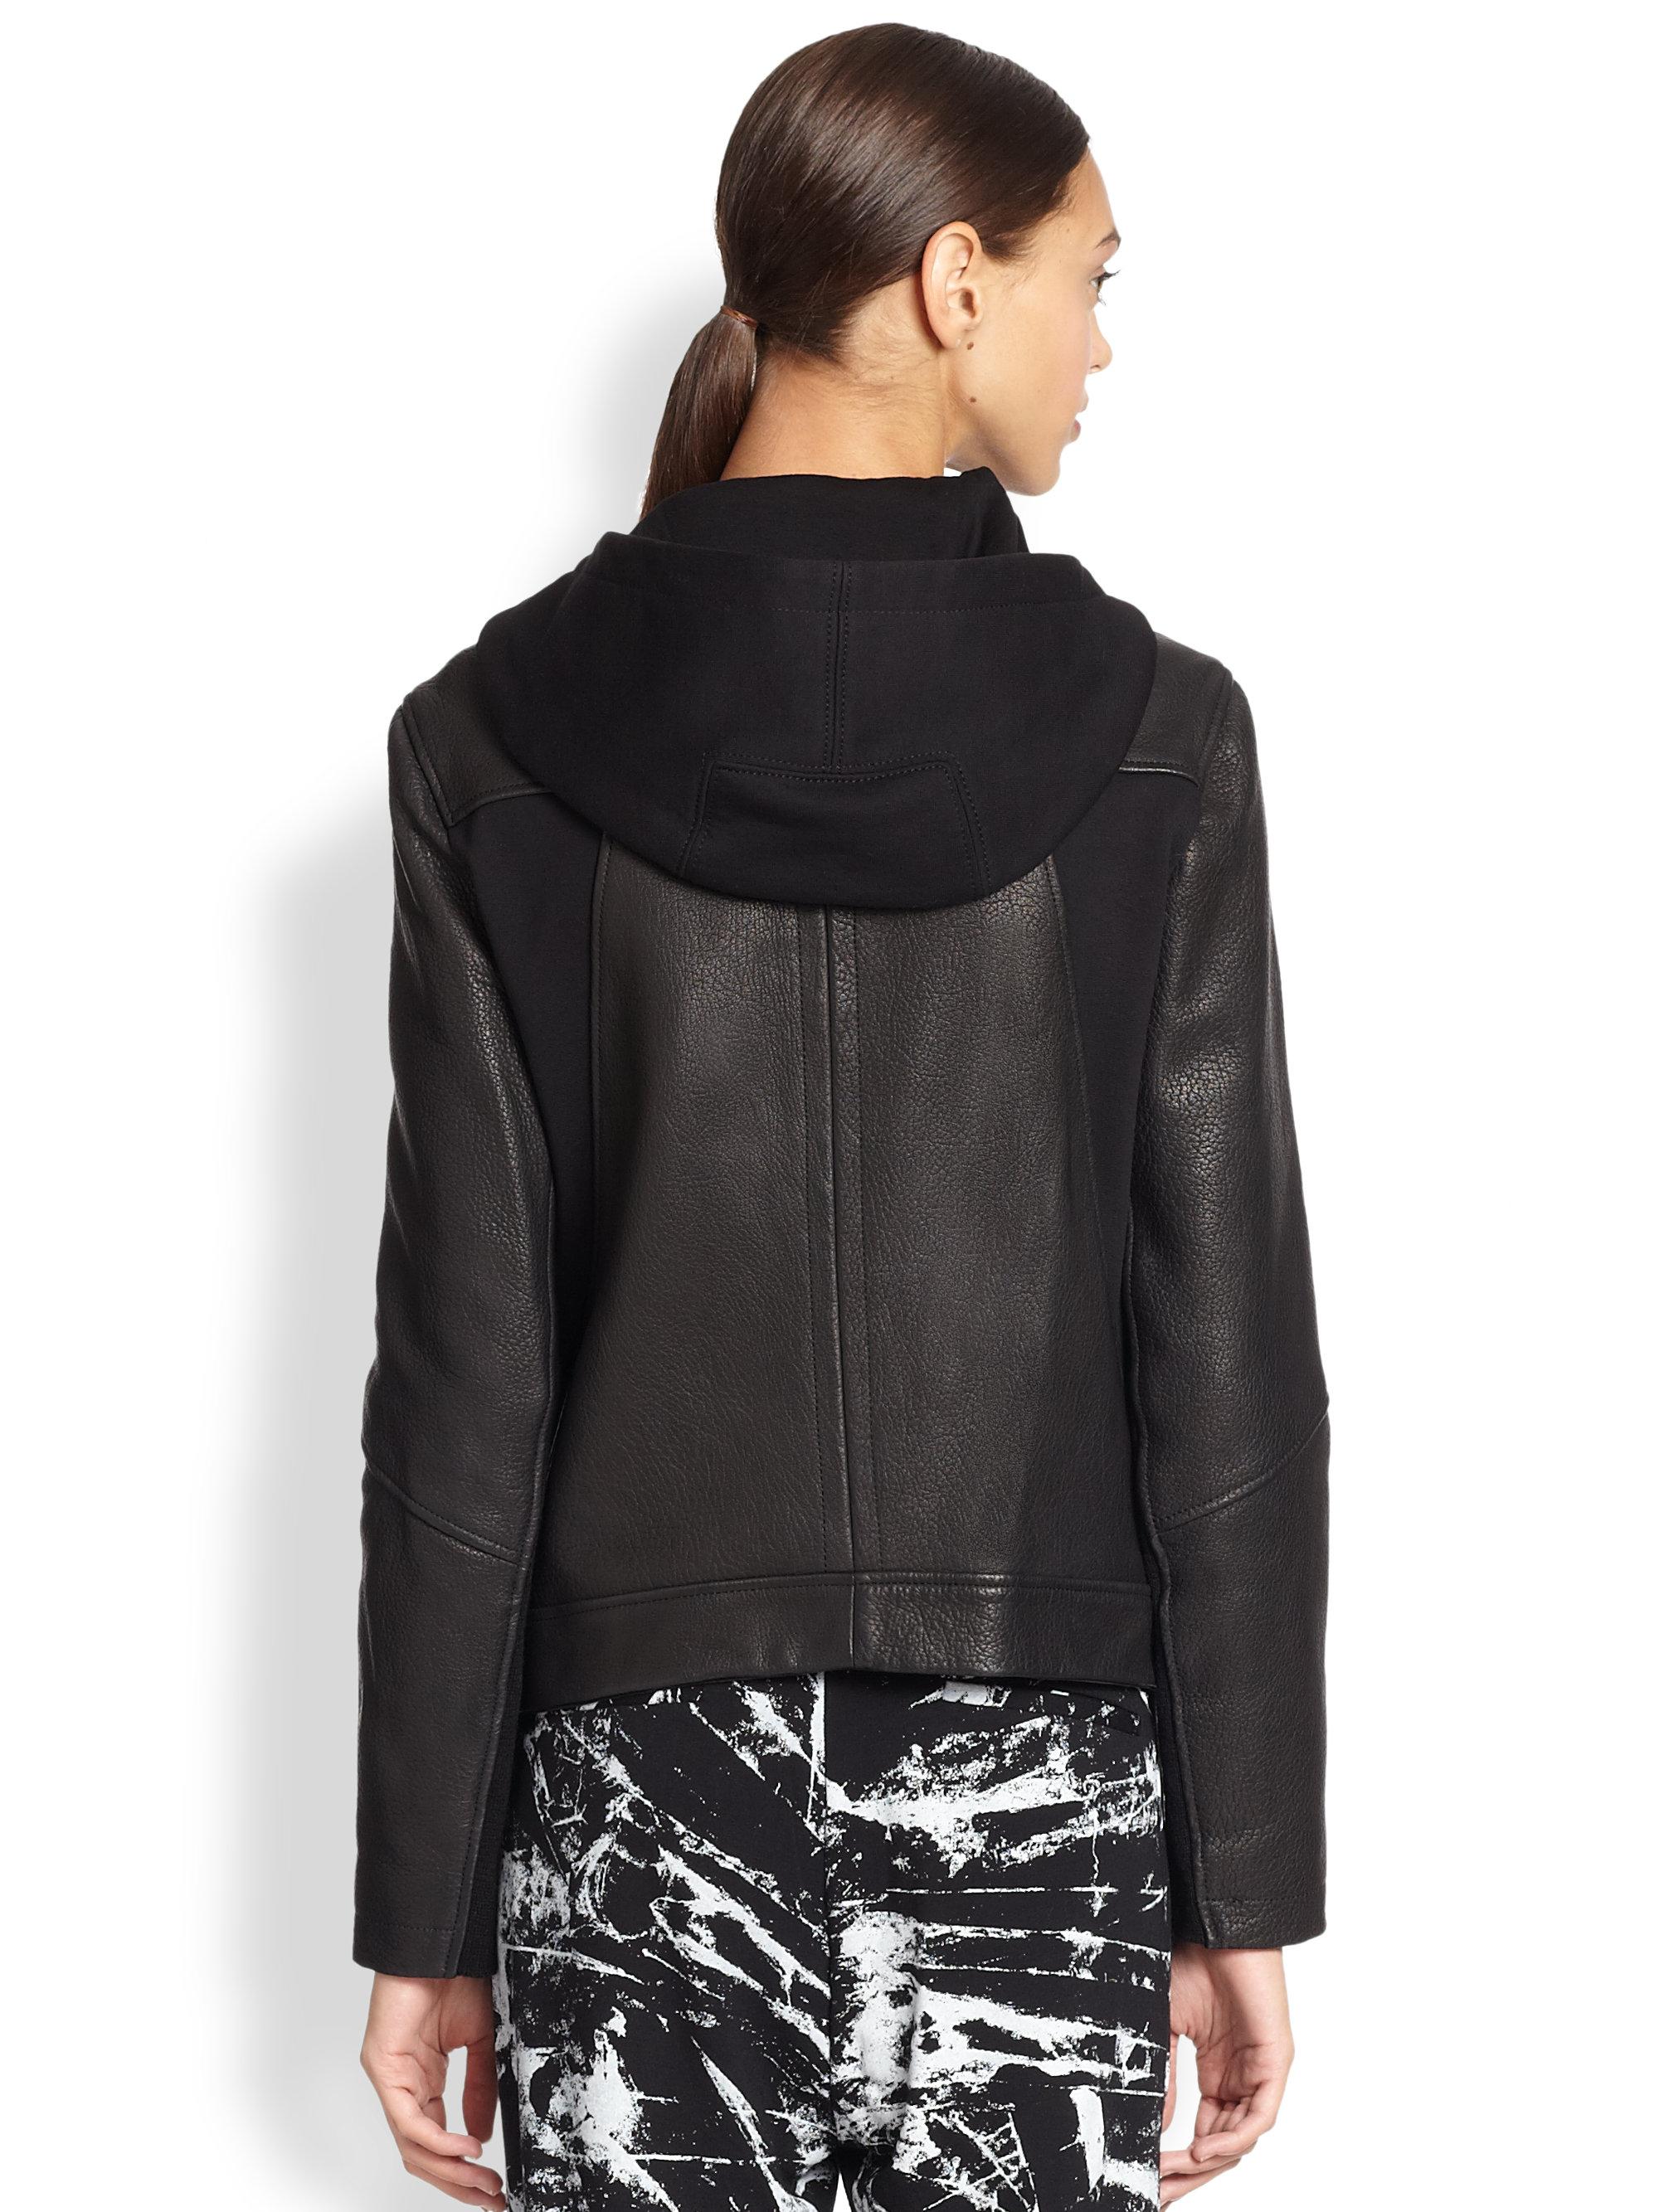 Alpinestars Leather Jacket >> Helmut lang Leather & Jersey Hooded Jacket in Black for ...